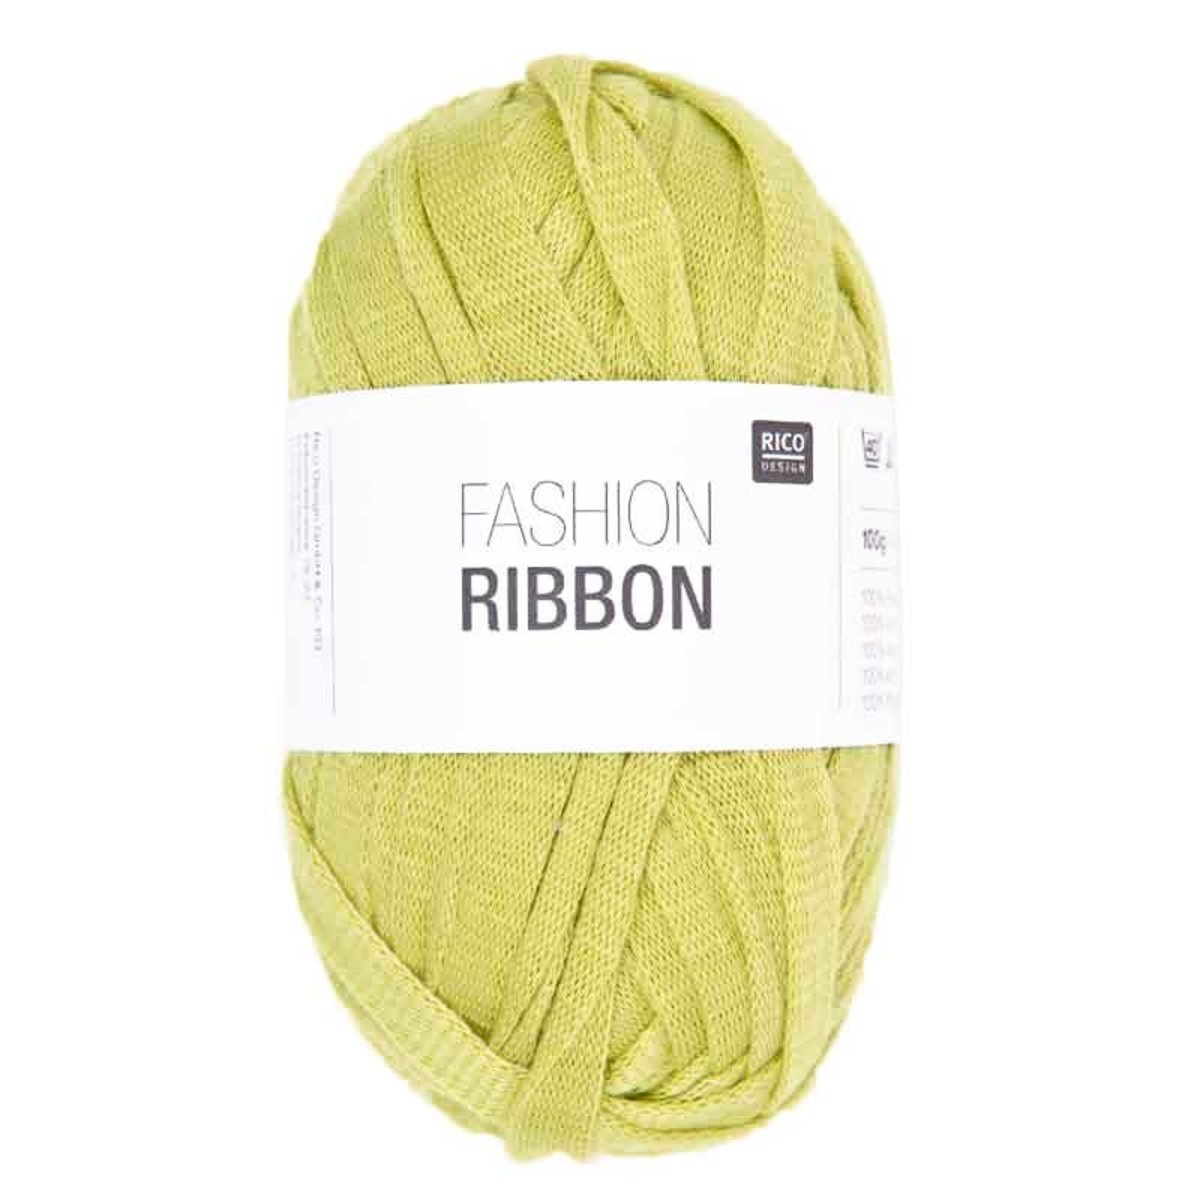 Bild 1 von Rico Design Fashion Ribbon 100g 40m